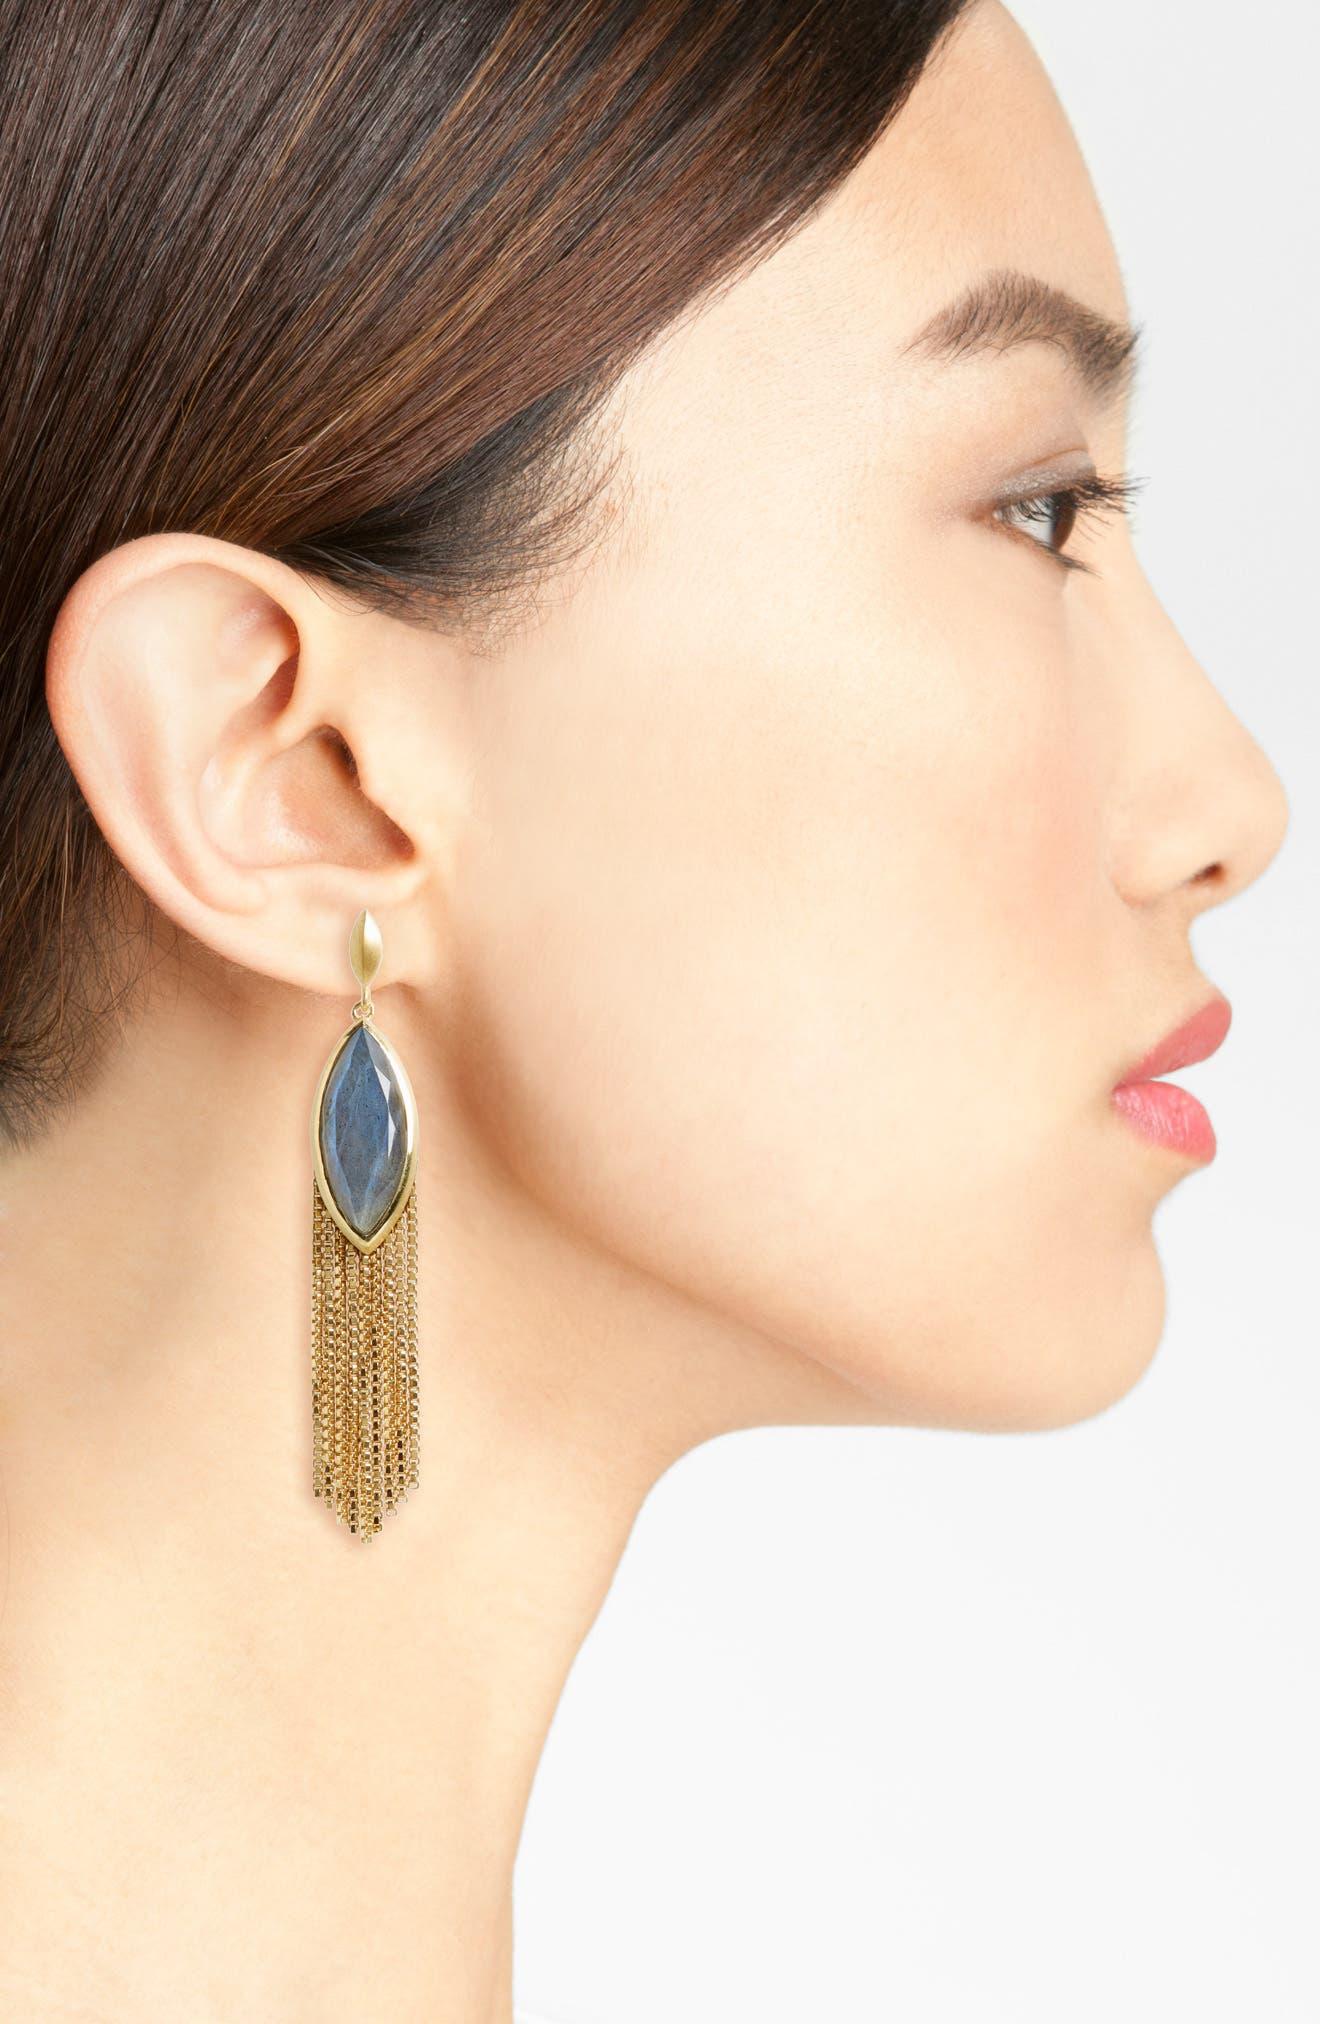 Ornate Semiprecious Stone Fringe Earrings,                             Alternate thumbnail 2, color,                             020